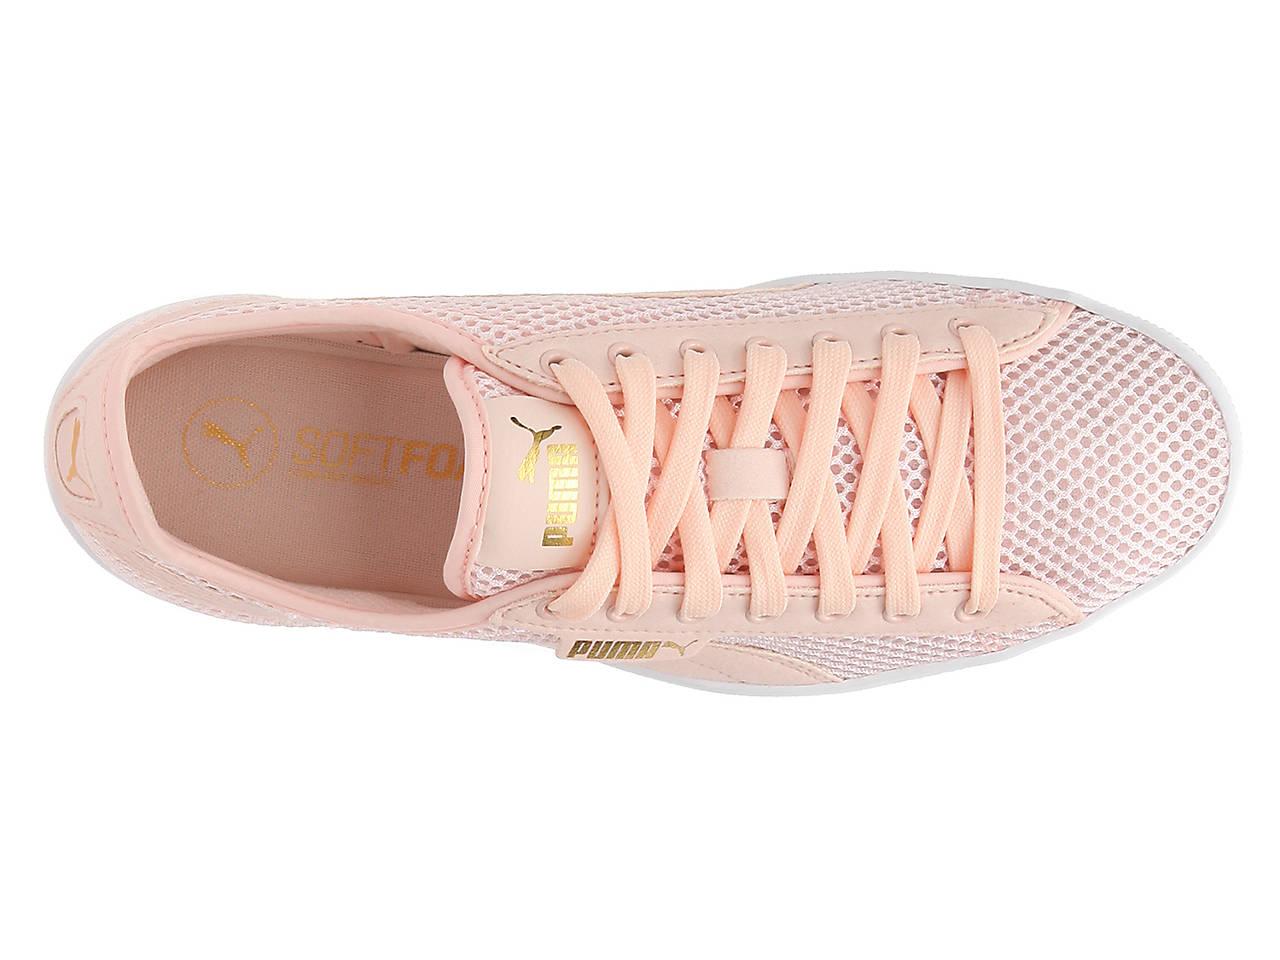 7bff907590b0 Puma Vikky Mesh Sneaker - Women s Women s Shoes